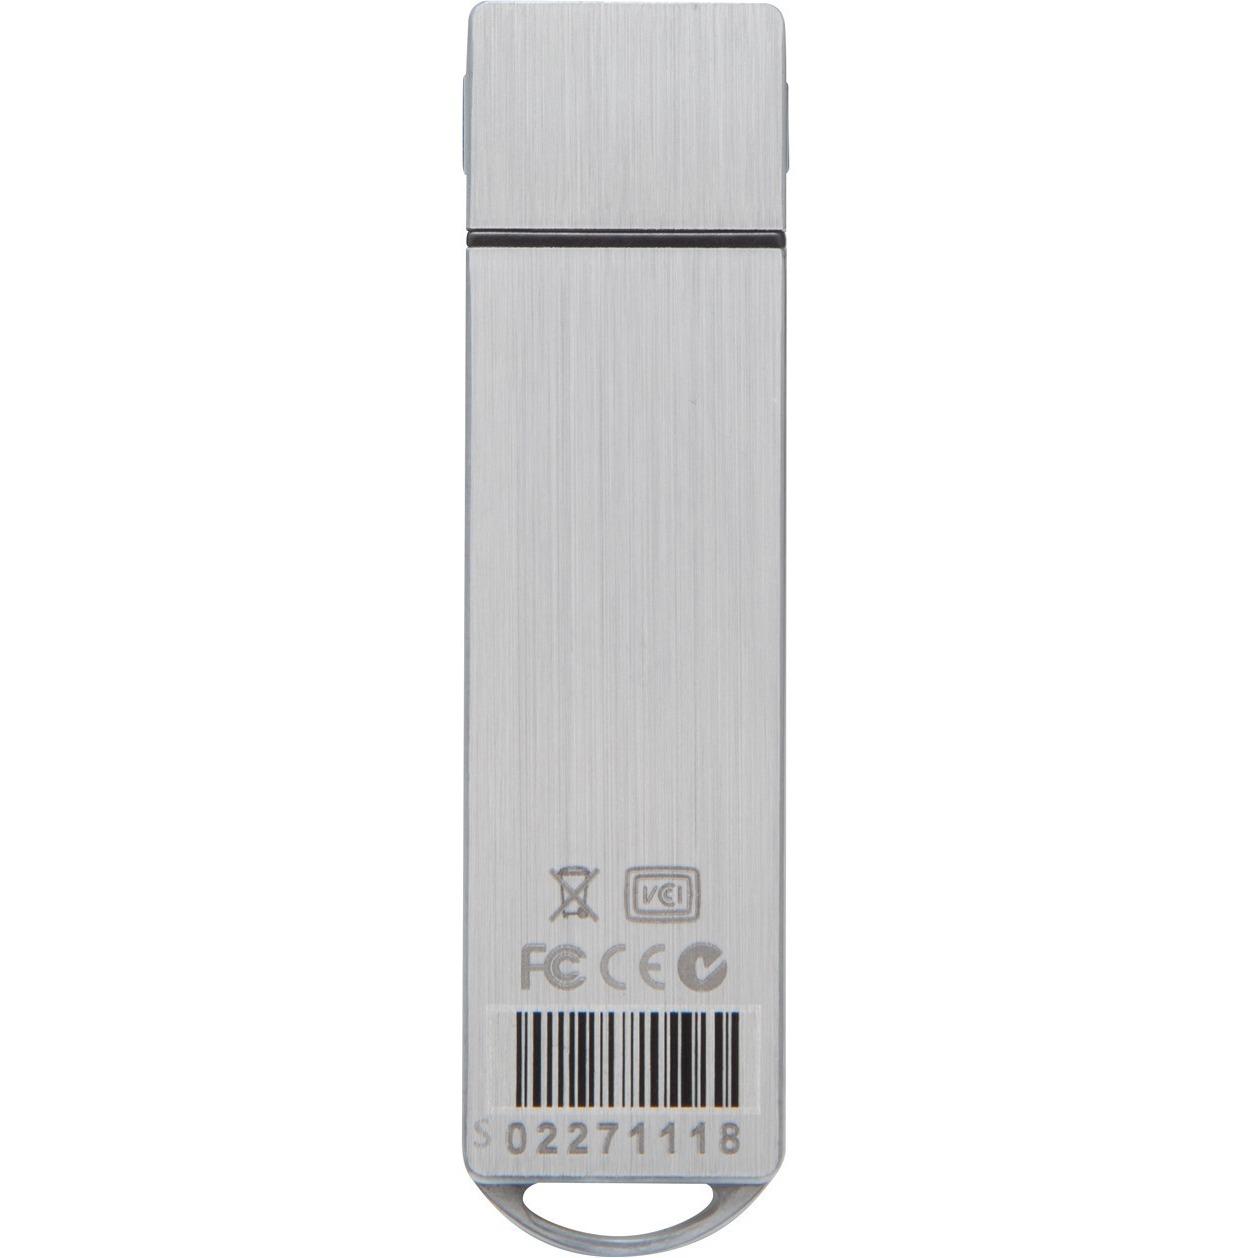 IronKey Basic S1000 64 GB USB 3.0 Flash Drive - 256-bit AES